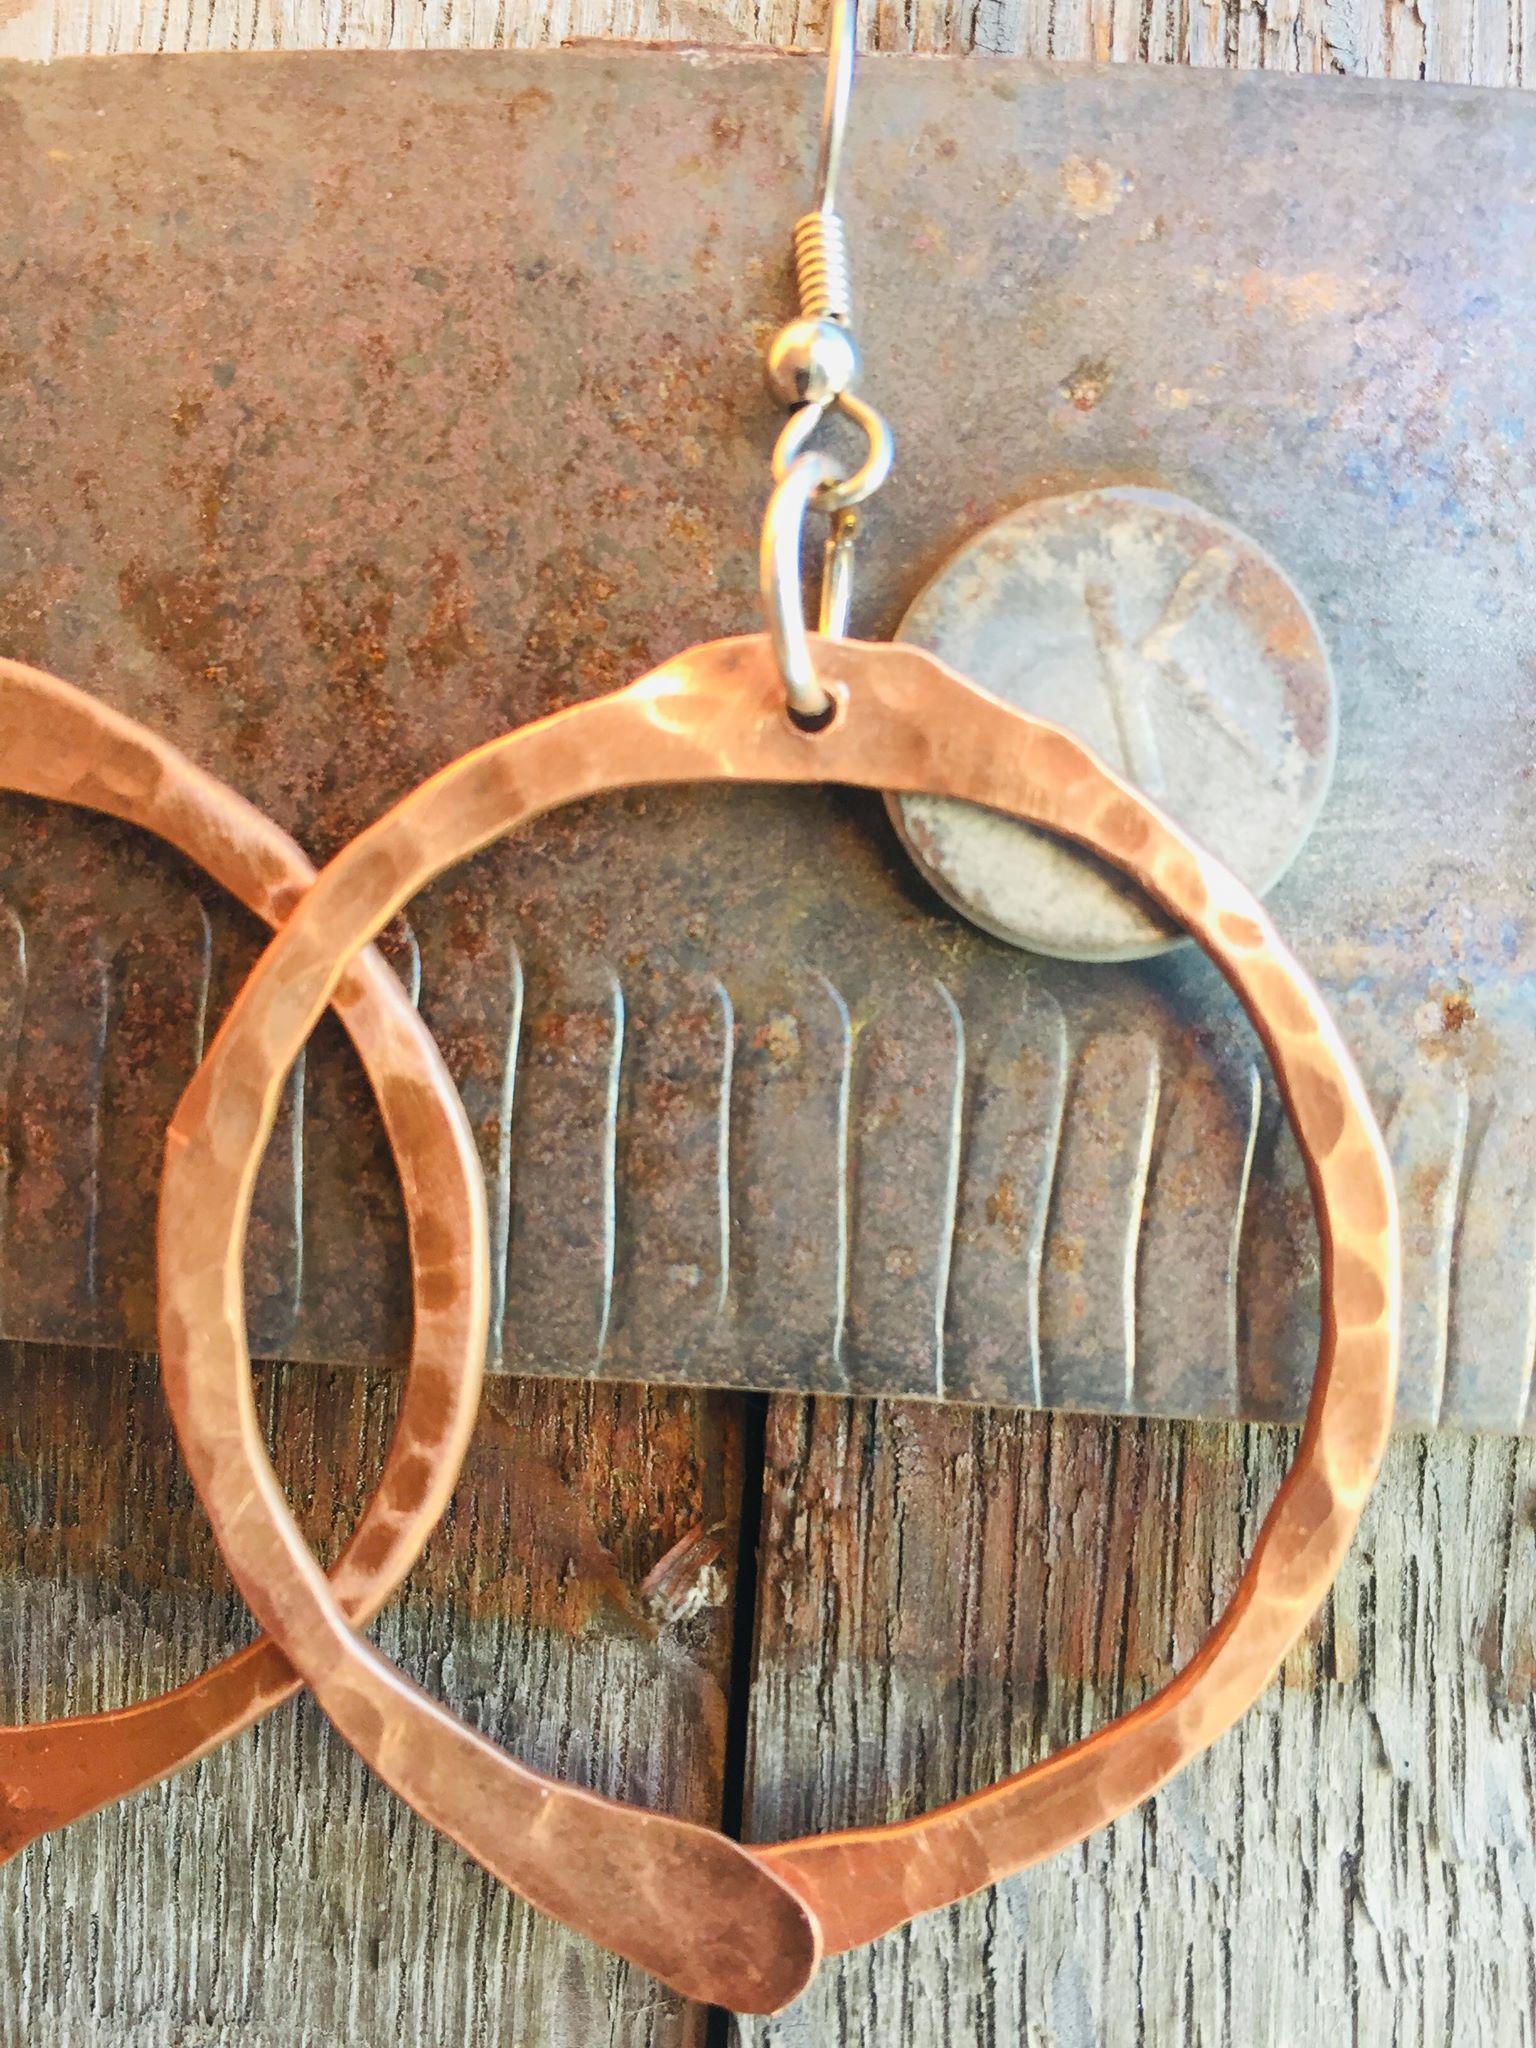 Hand crafted jewelry wire jewelry precious stones